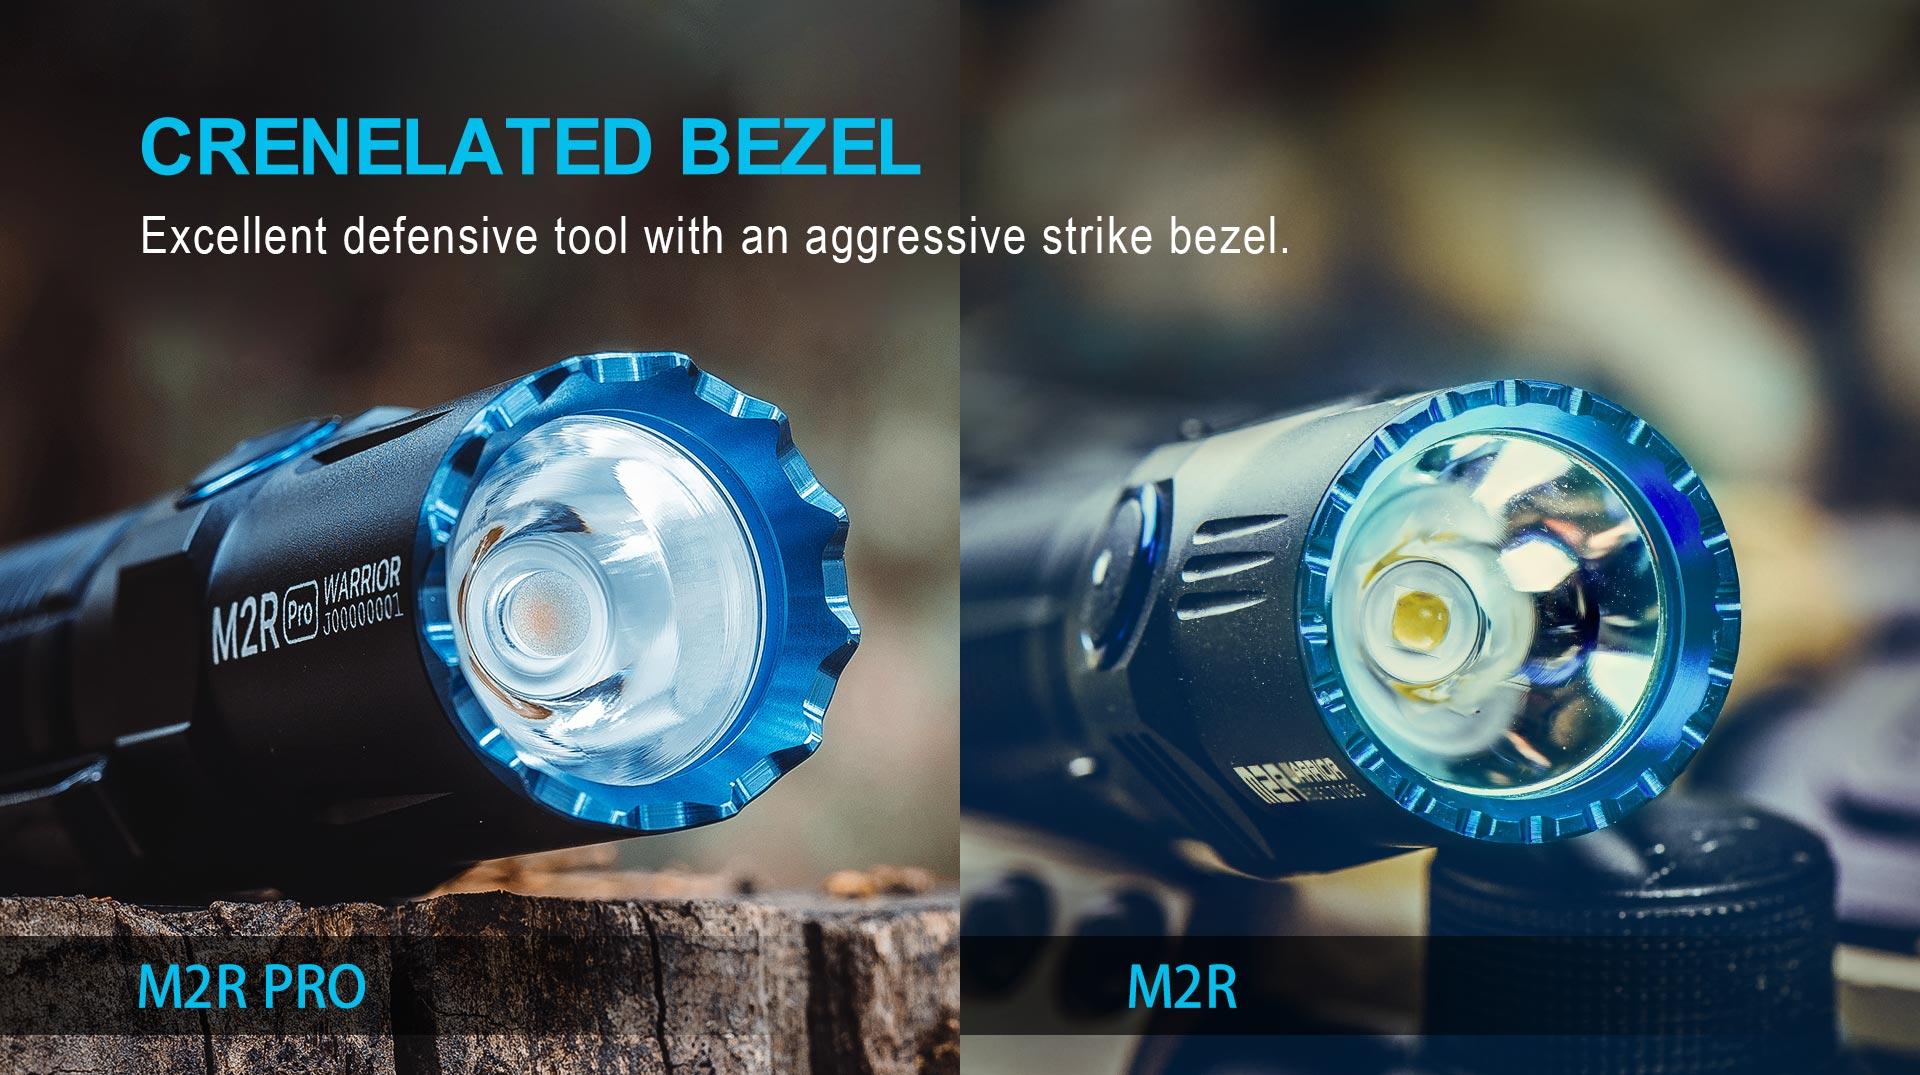 Olight M2R Pro Best Tactical Flashlight Bezel